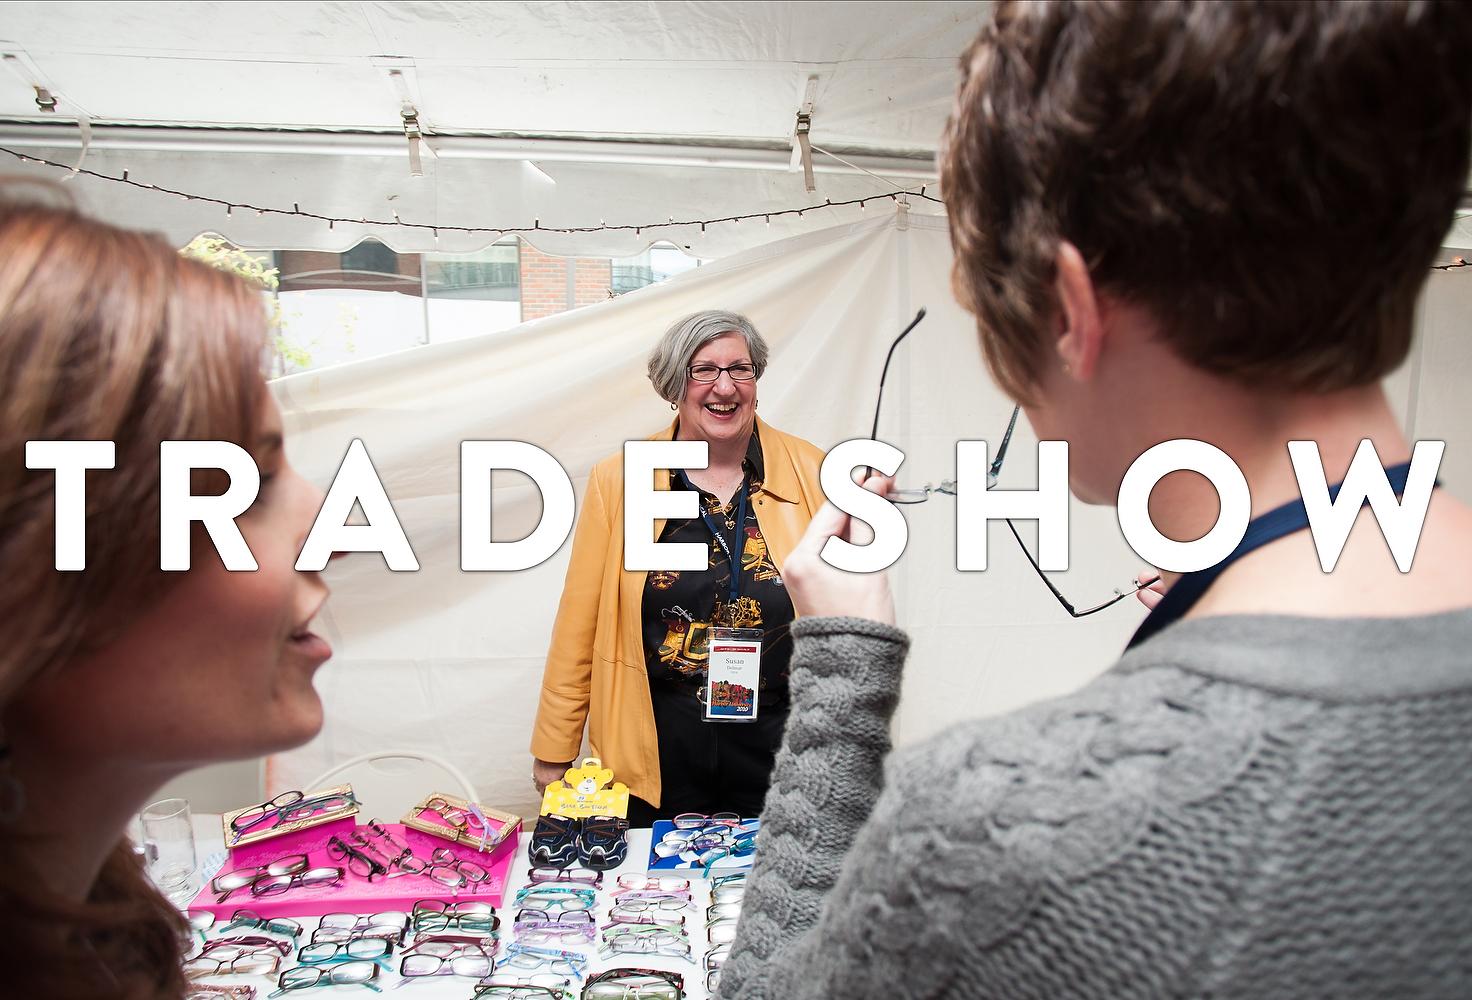 tradeshow-3771_ICONA.JPG